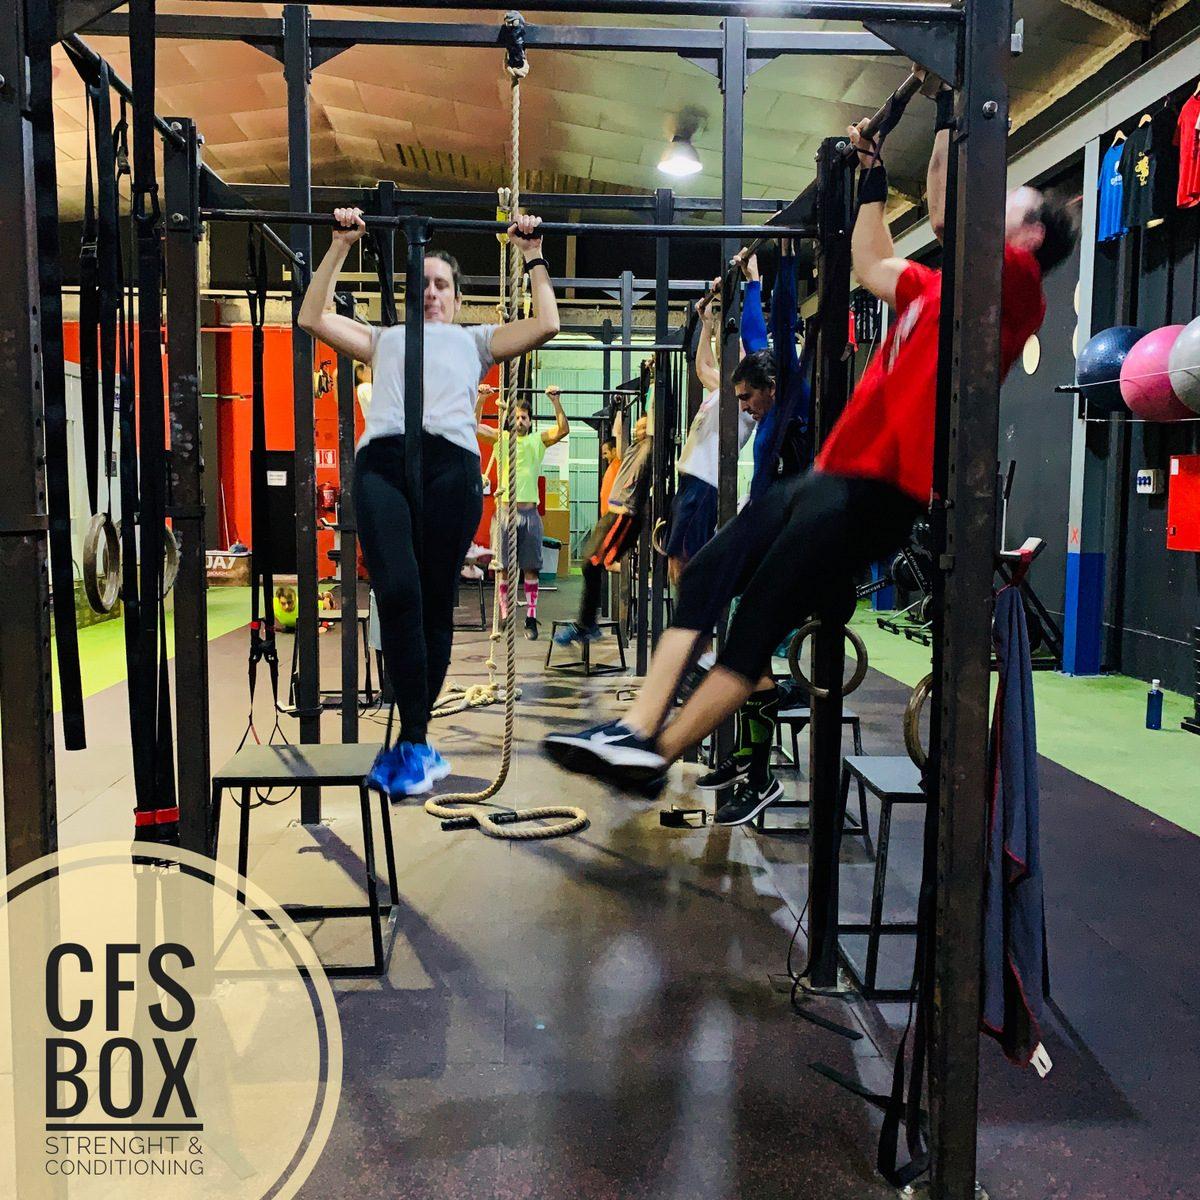 Wod CFS Box CrossFit Sevilla training lions